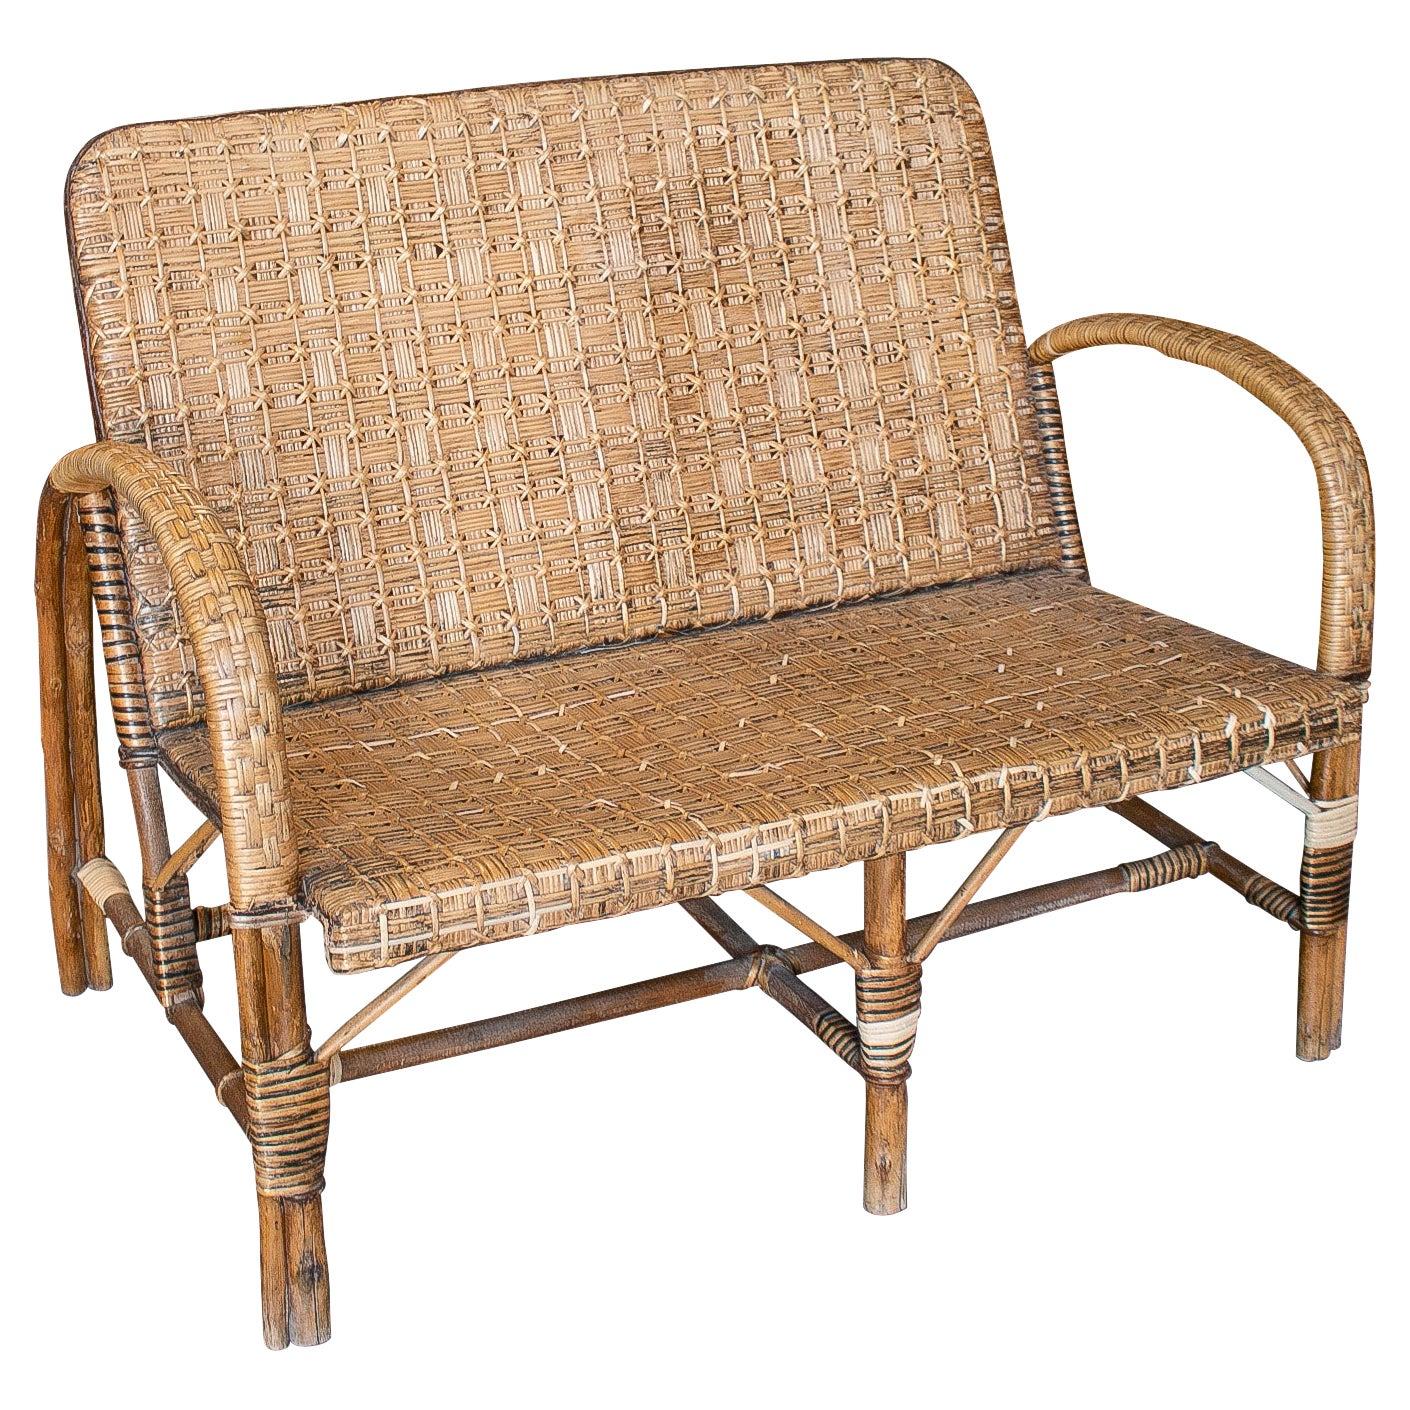 1950s Spanish 2-Seater Woven Wicker & Wood Sofa